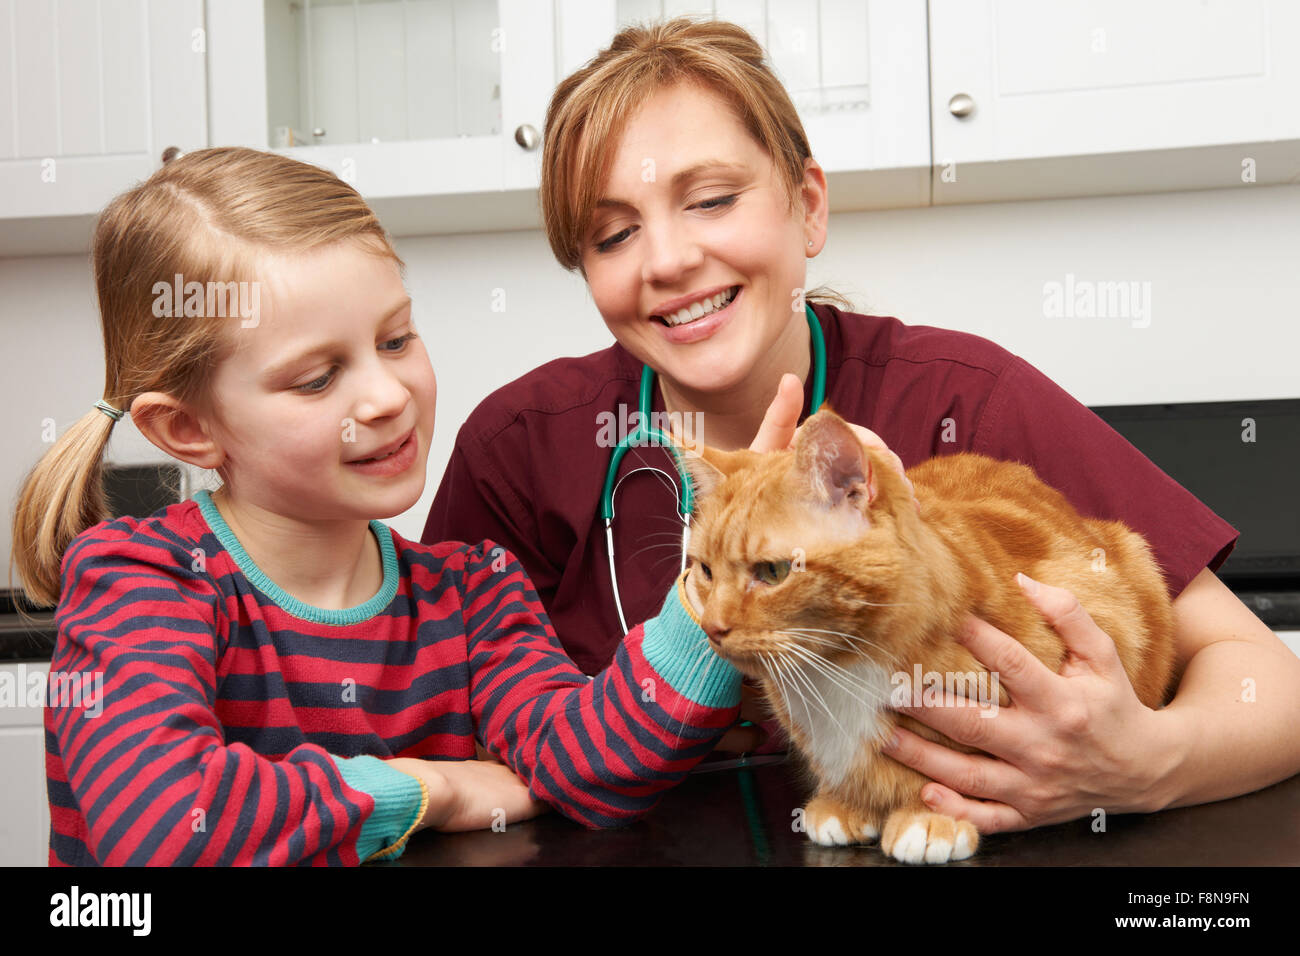 Girl Taking Pet Cat To Vet For Examination - Stock Image